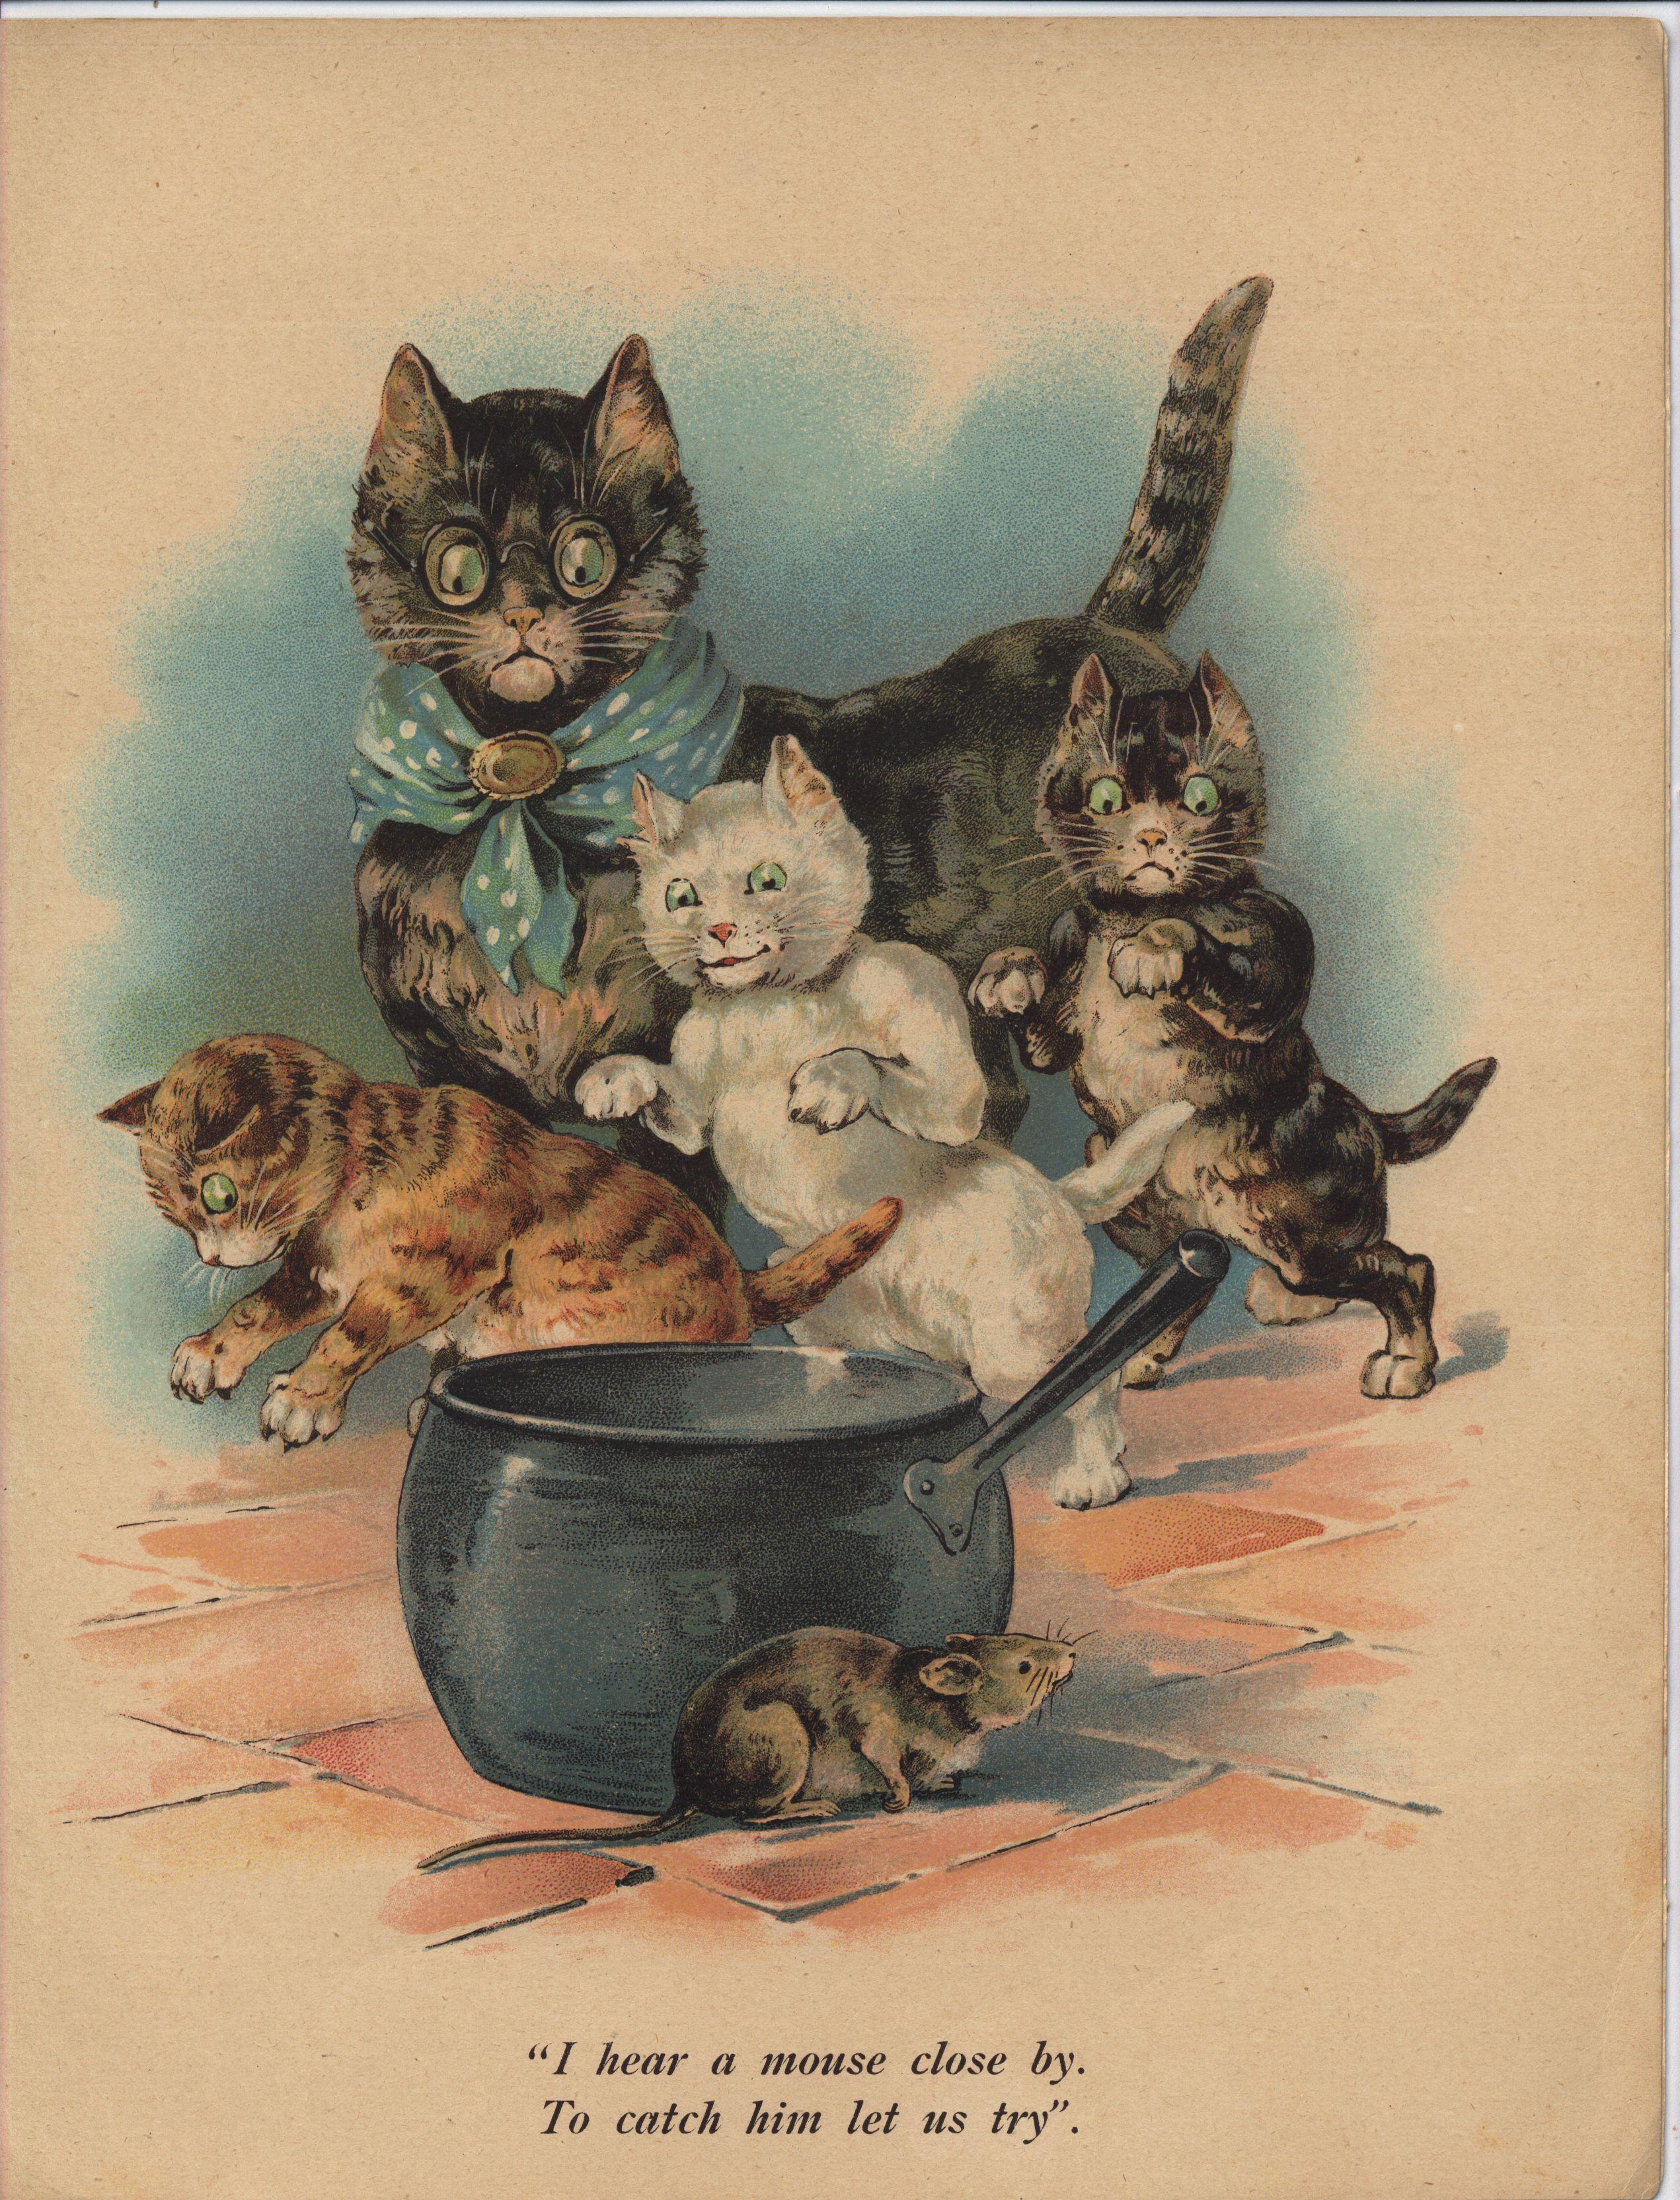 Full Sized Image Three Little Kittens Cats Illustration Storybook Art Cat Art